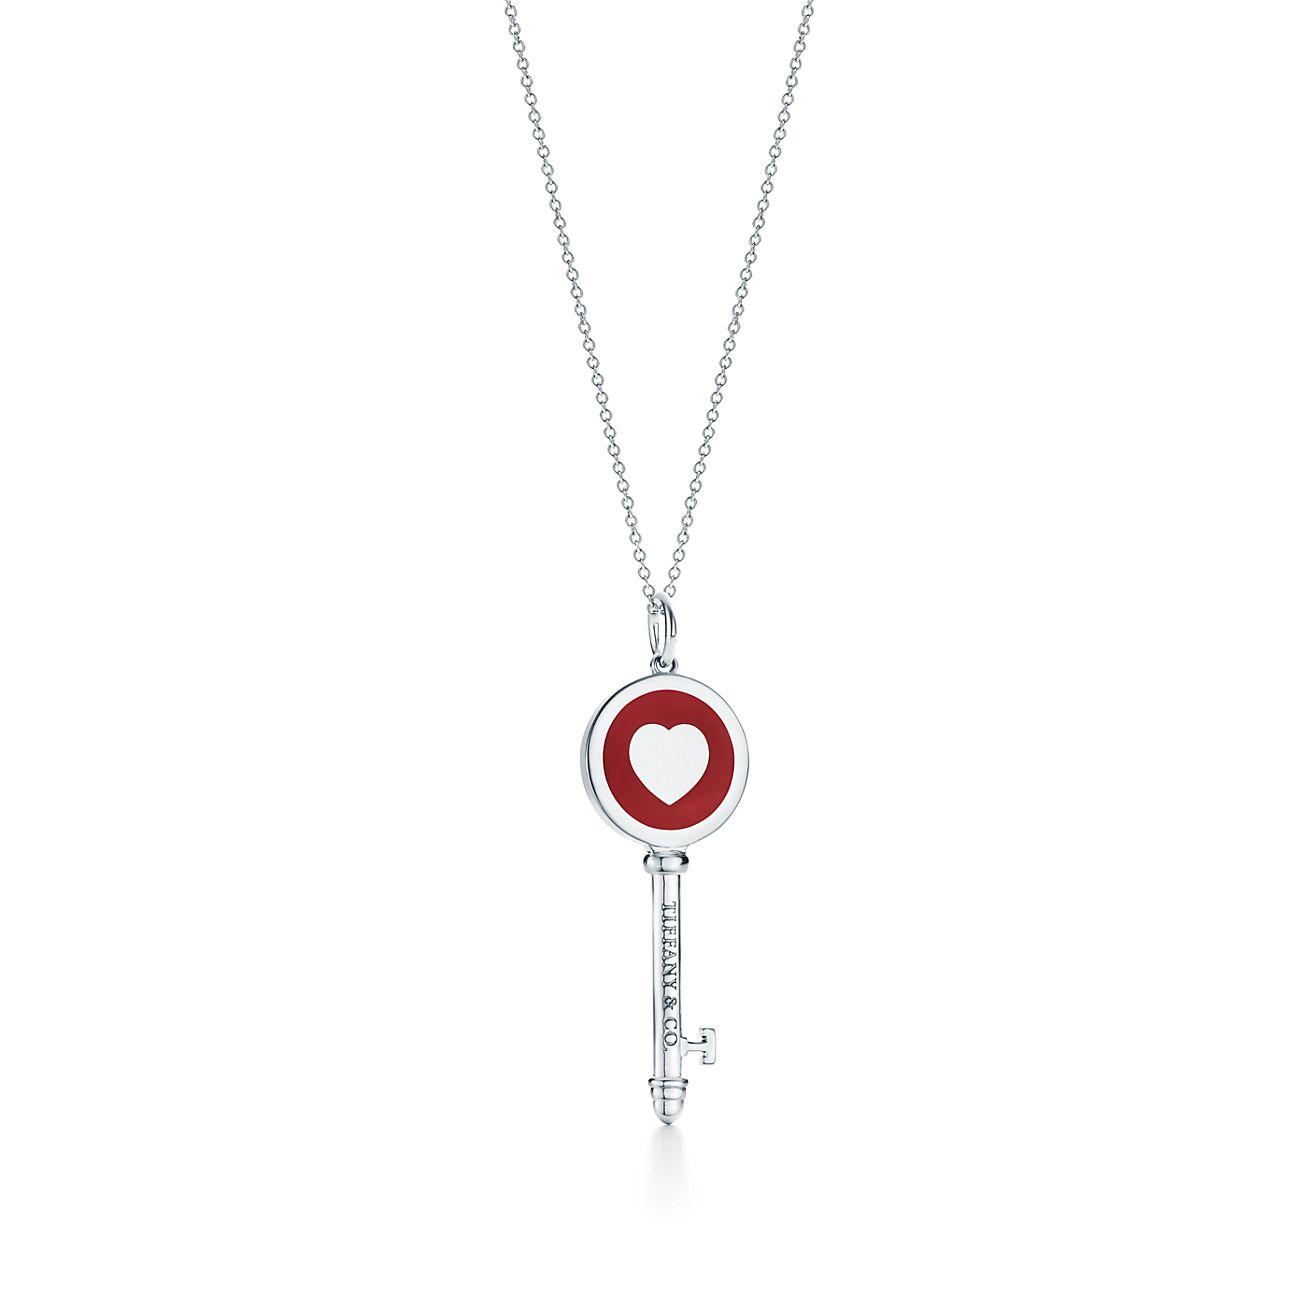 Tiffany keys heart key pendant in silver with red enamel finish tiffany keysheart pendant aloadofball Choice Image